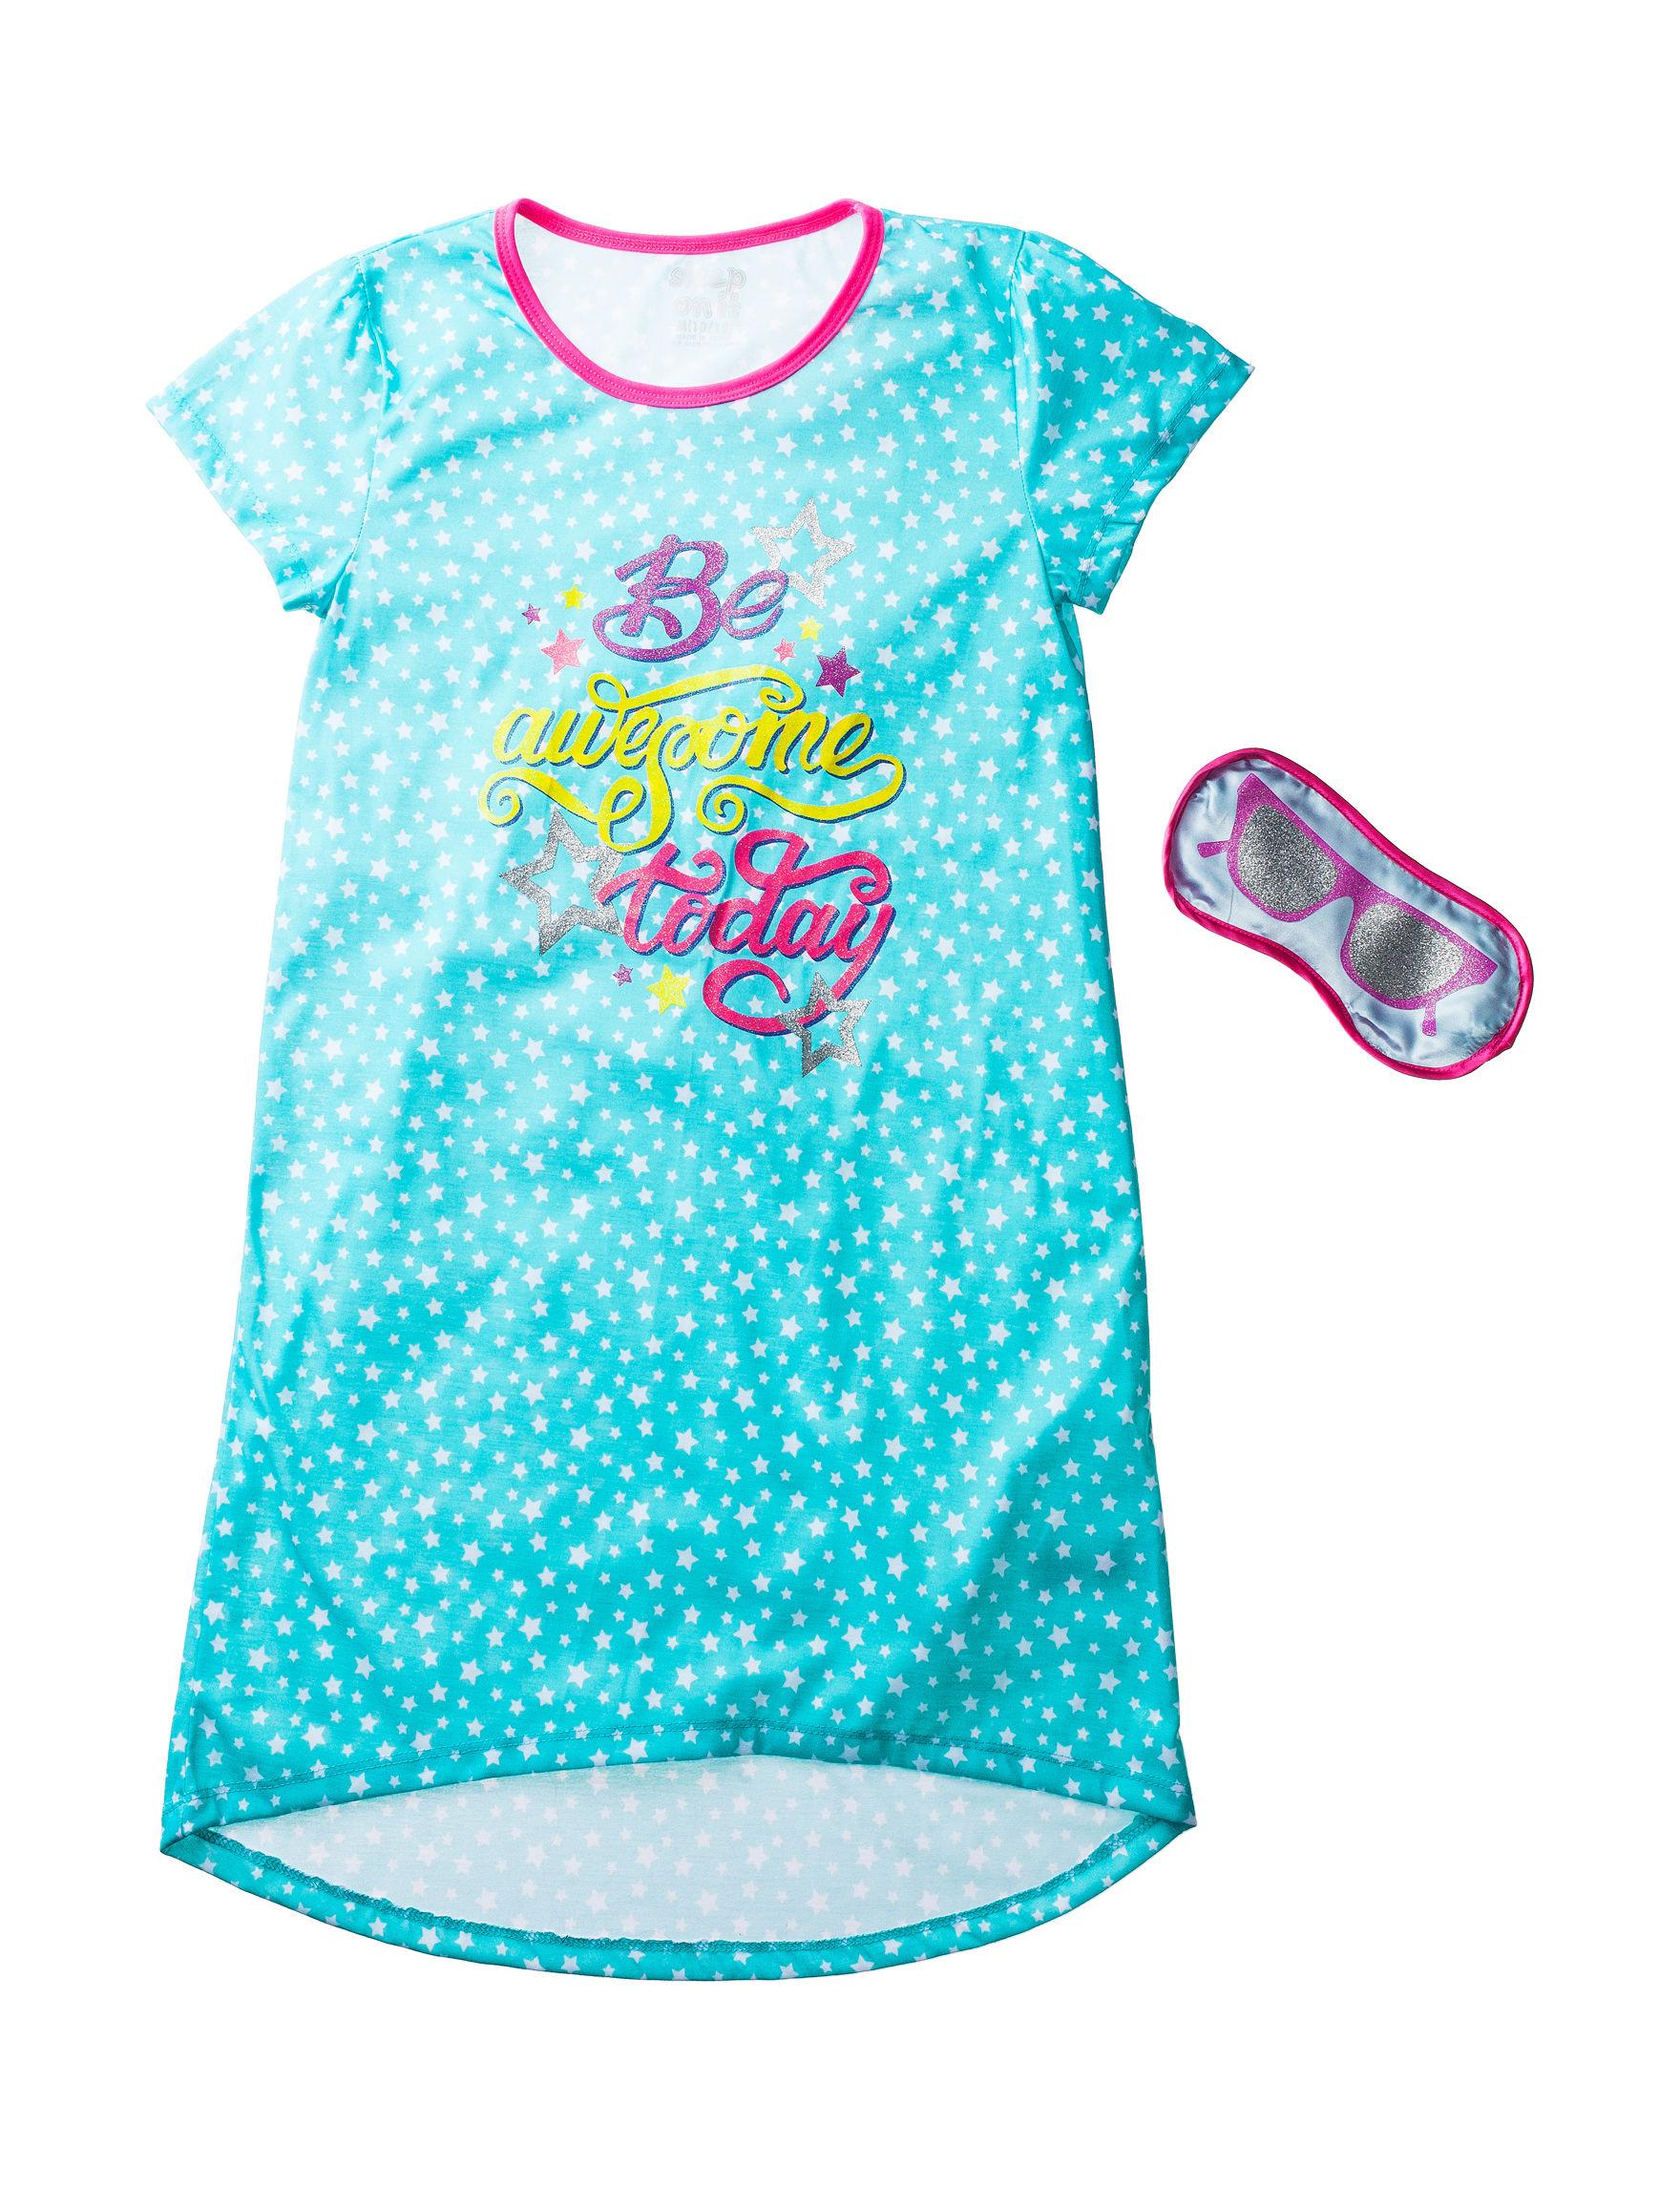 Cloud Nine Blue Nightgowns & Sleep Shirts